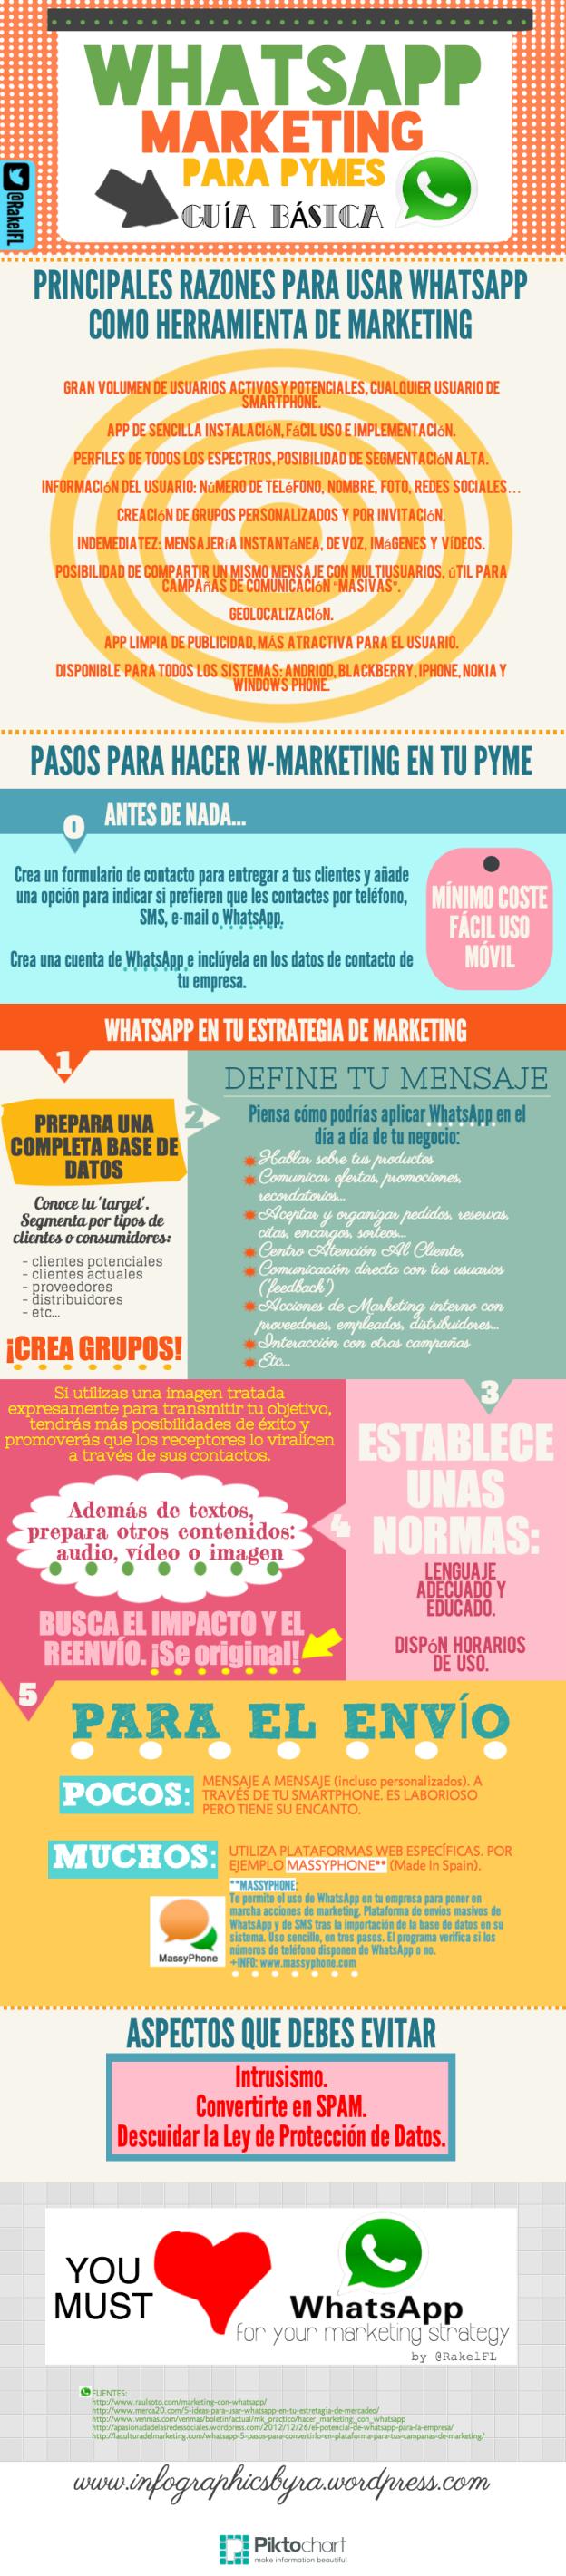 Guía de marketing con WhatsApp para pymes